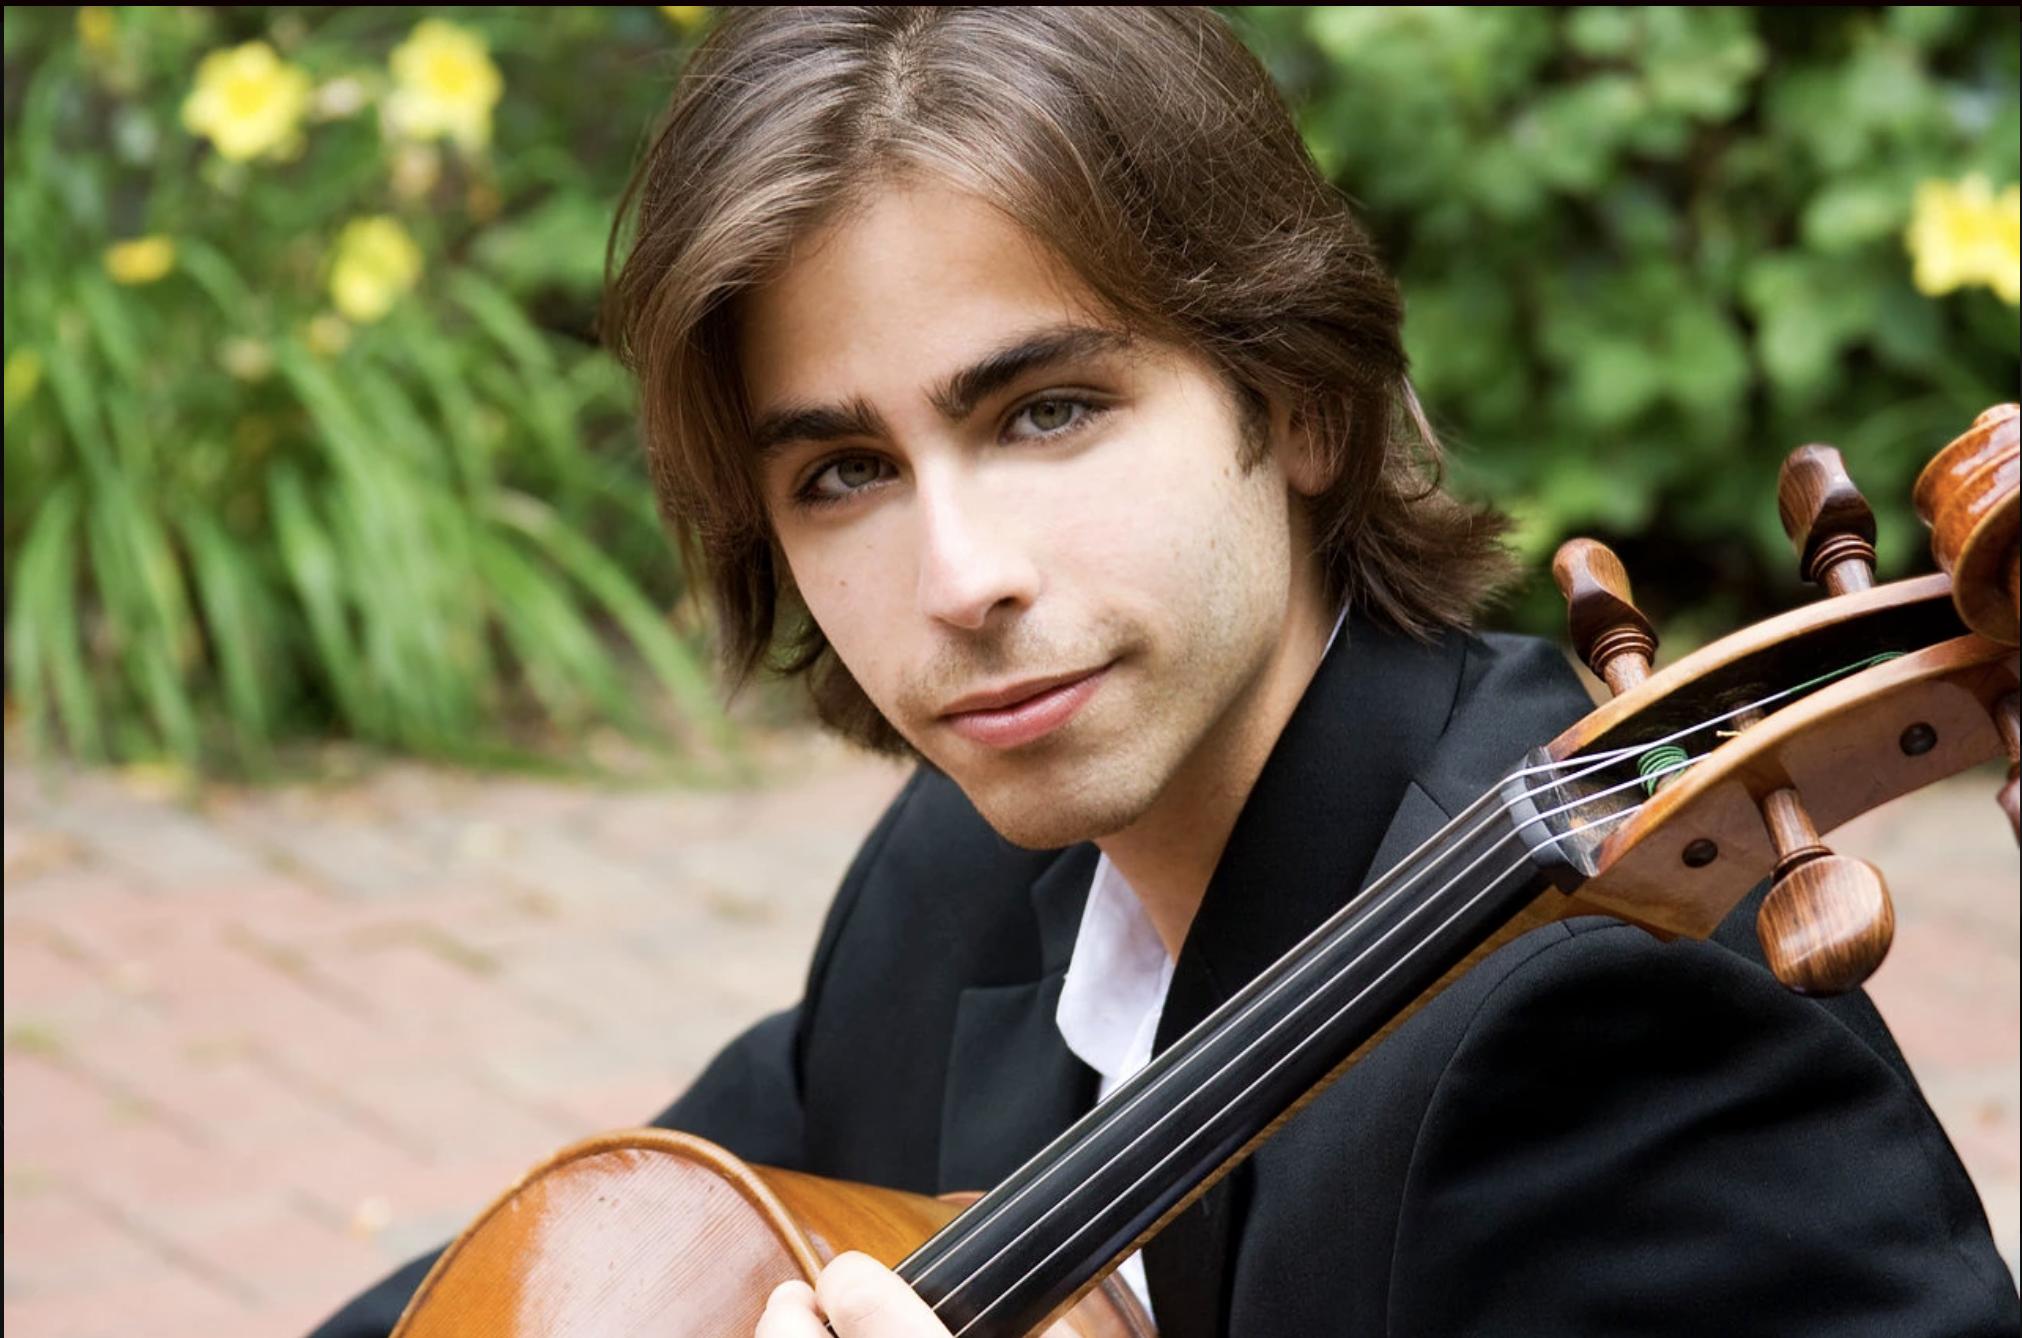 Dr. Carmine Miranda , Cello Dogal USA Artist D.M.A Cincinnati Conservatory